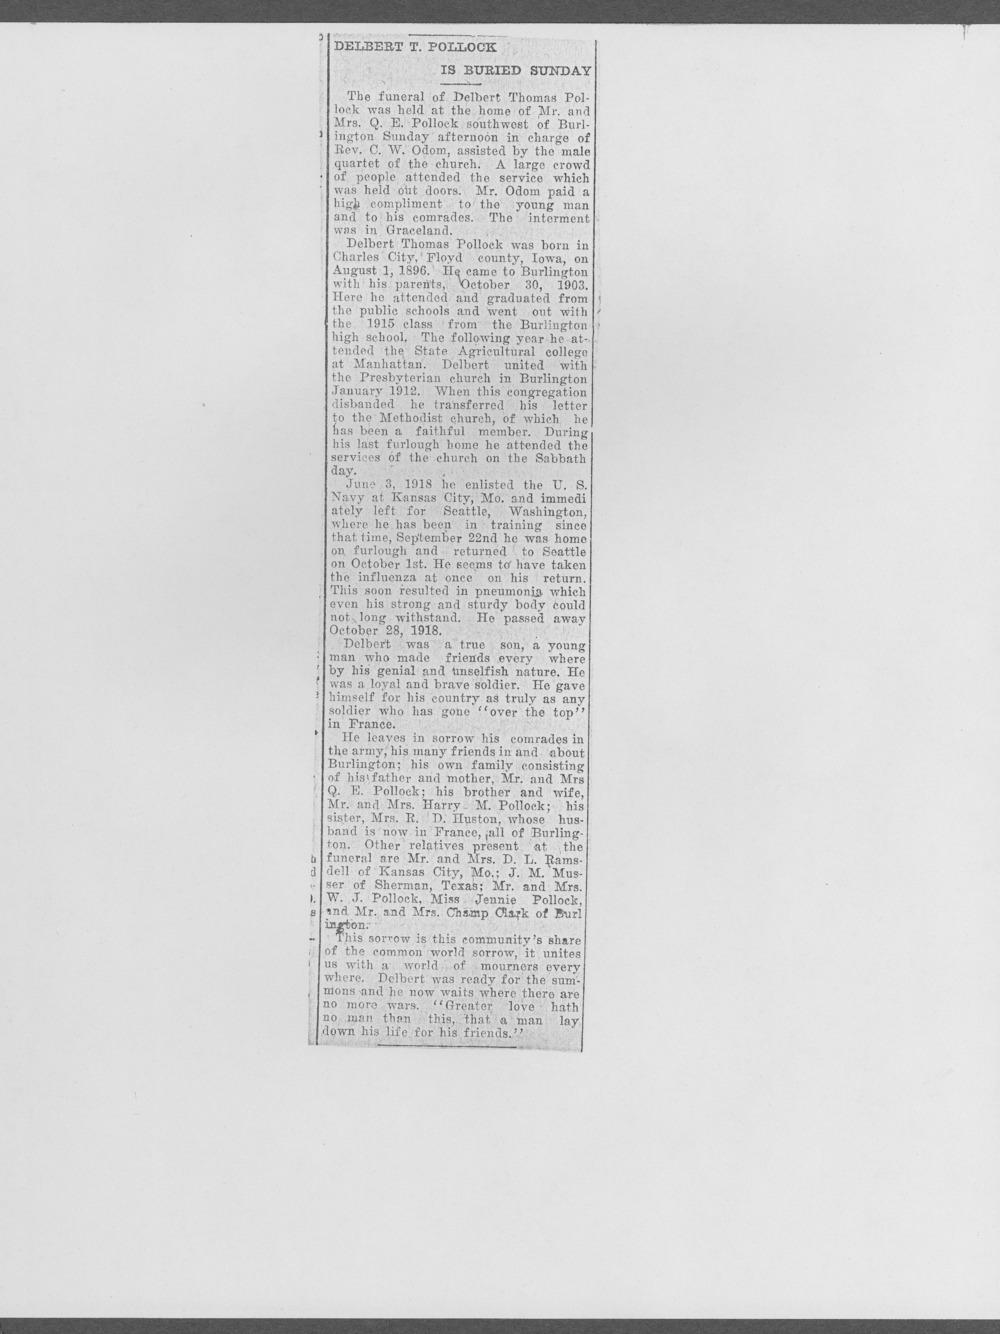 Delbert T. Pollock, World War I soldier - 2